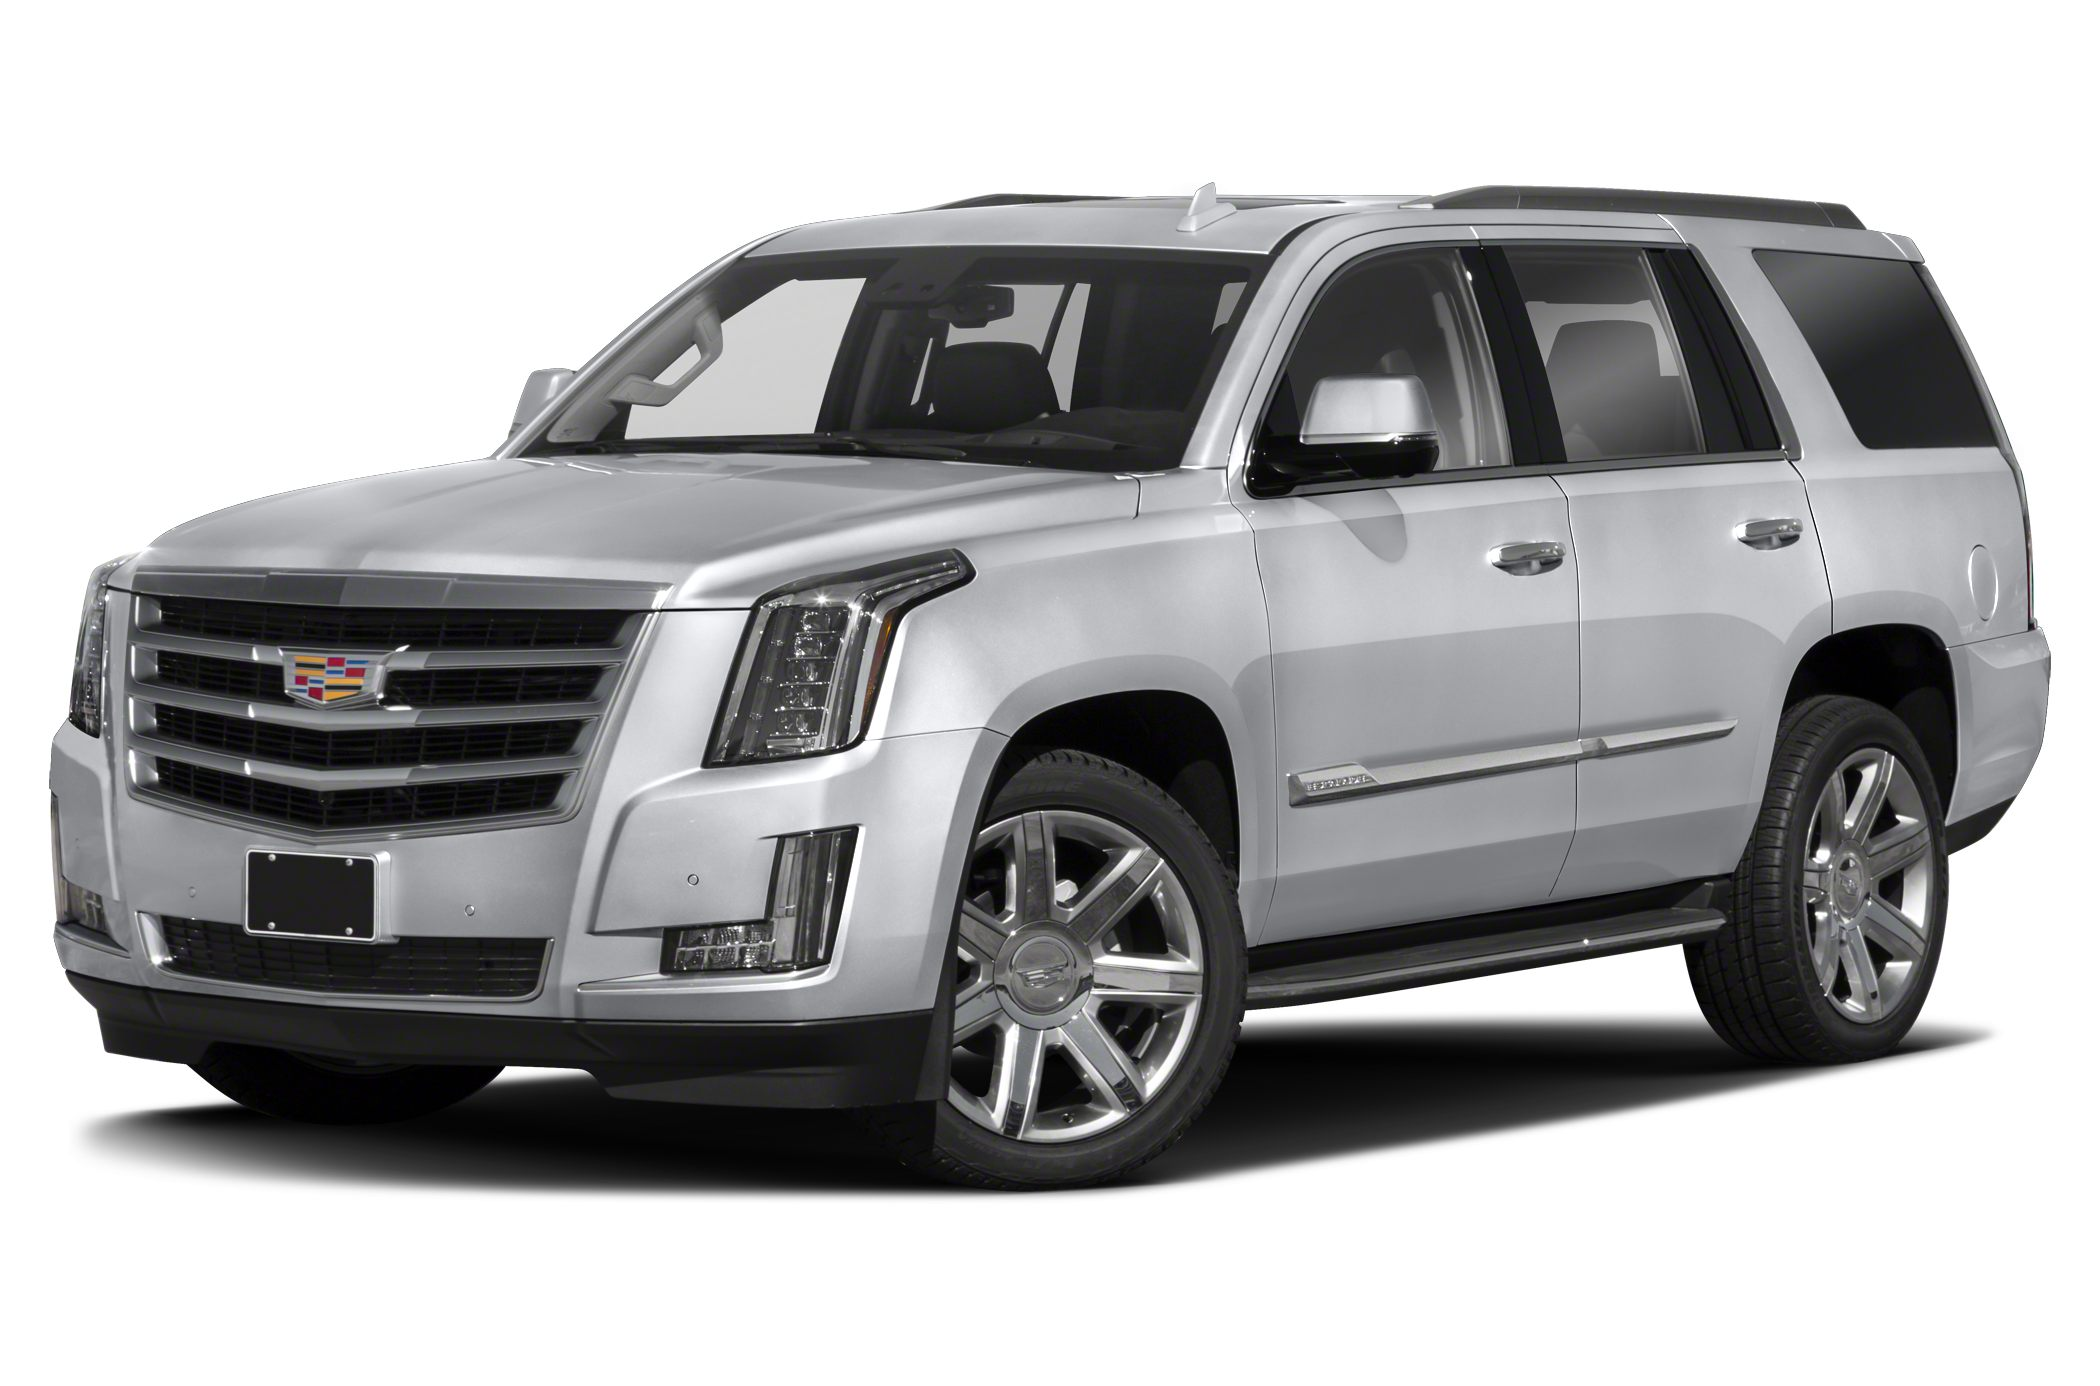 Cadillac Escalade Image